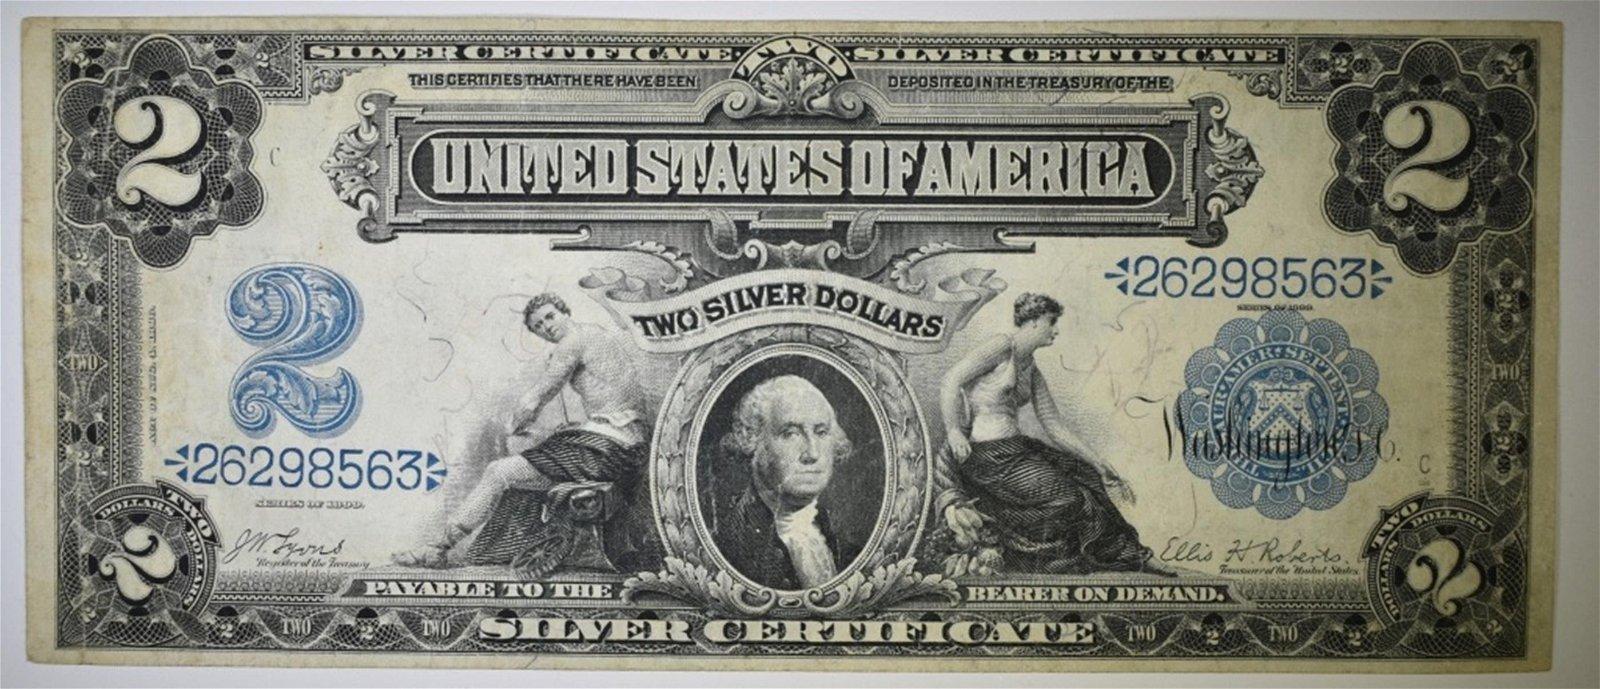 1899 $2 SILVER CERTIFICATE FINE